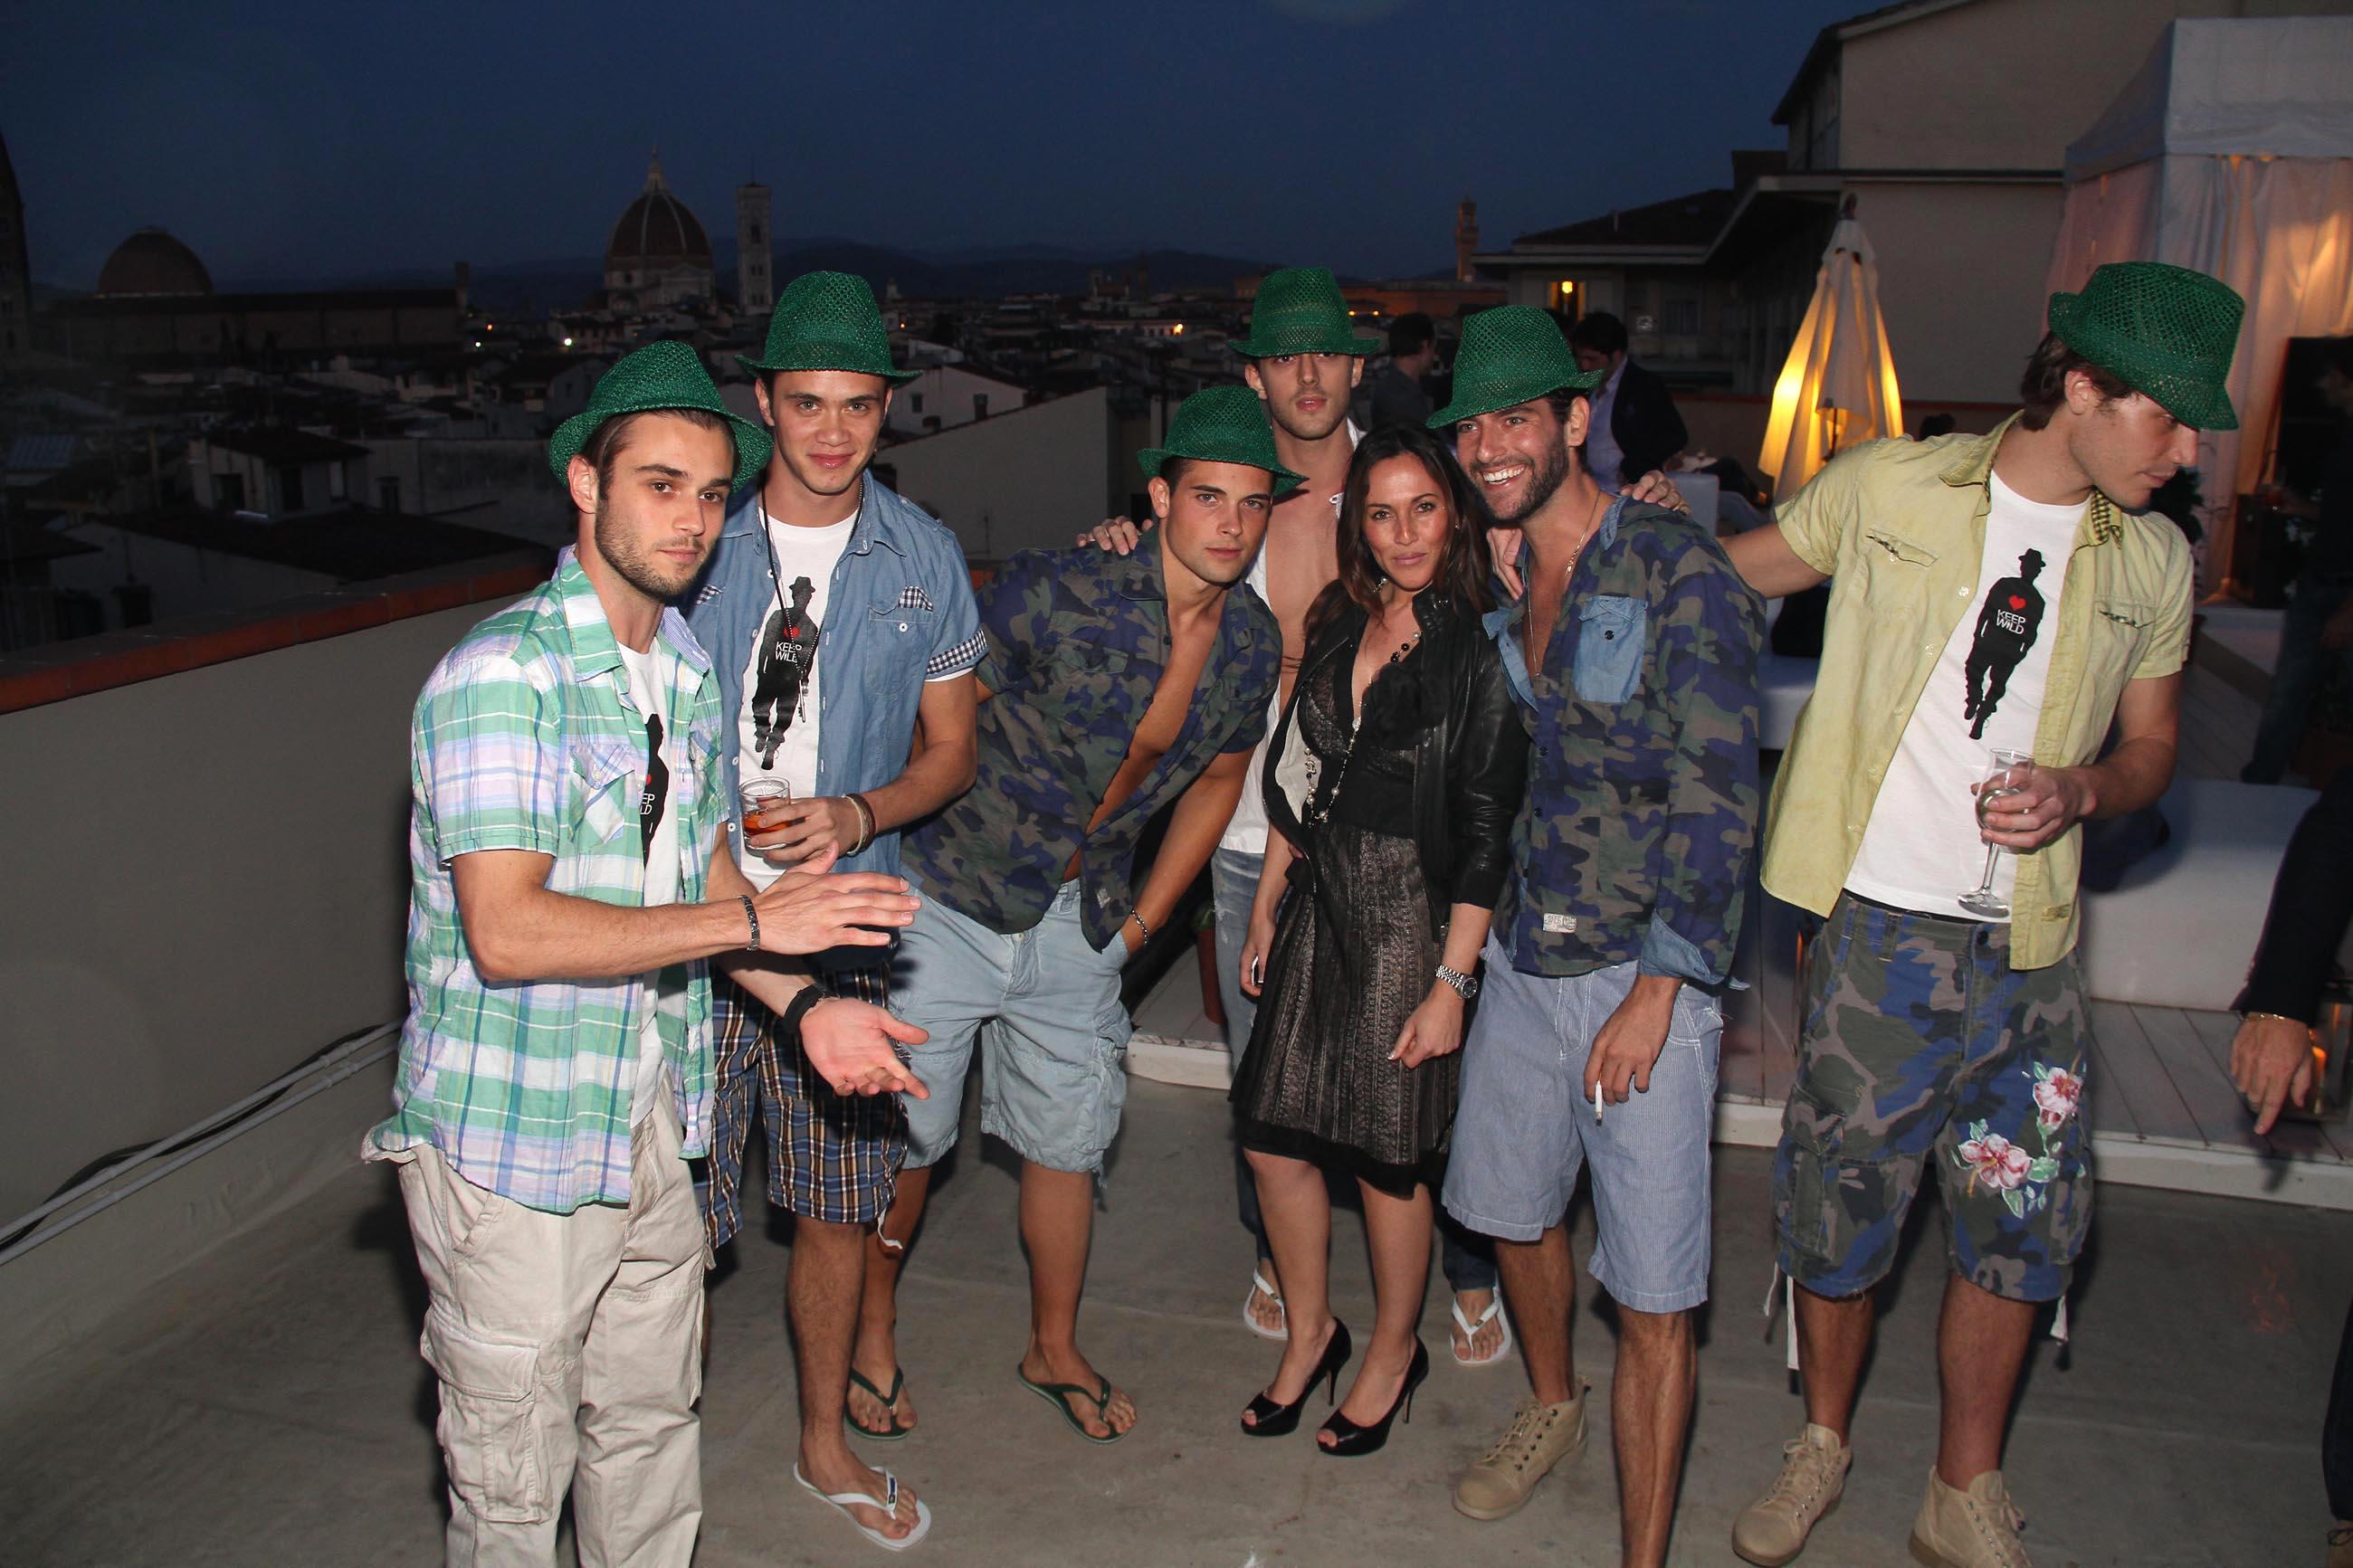 PRESSPHOTO Firenze, Garage Europa, evento Keep Wild. Nella foto Natascha Elfring con i modelli